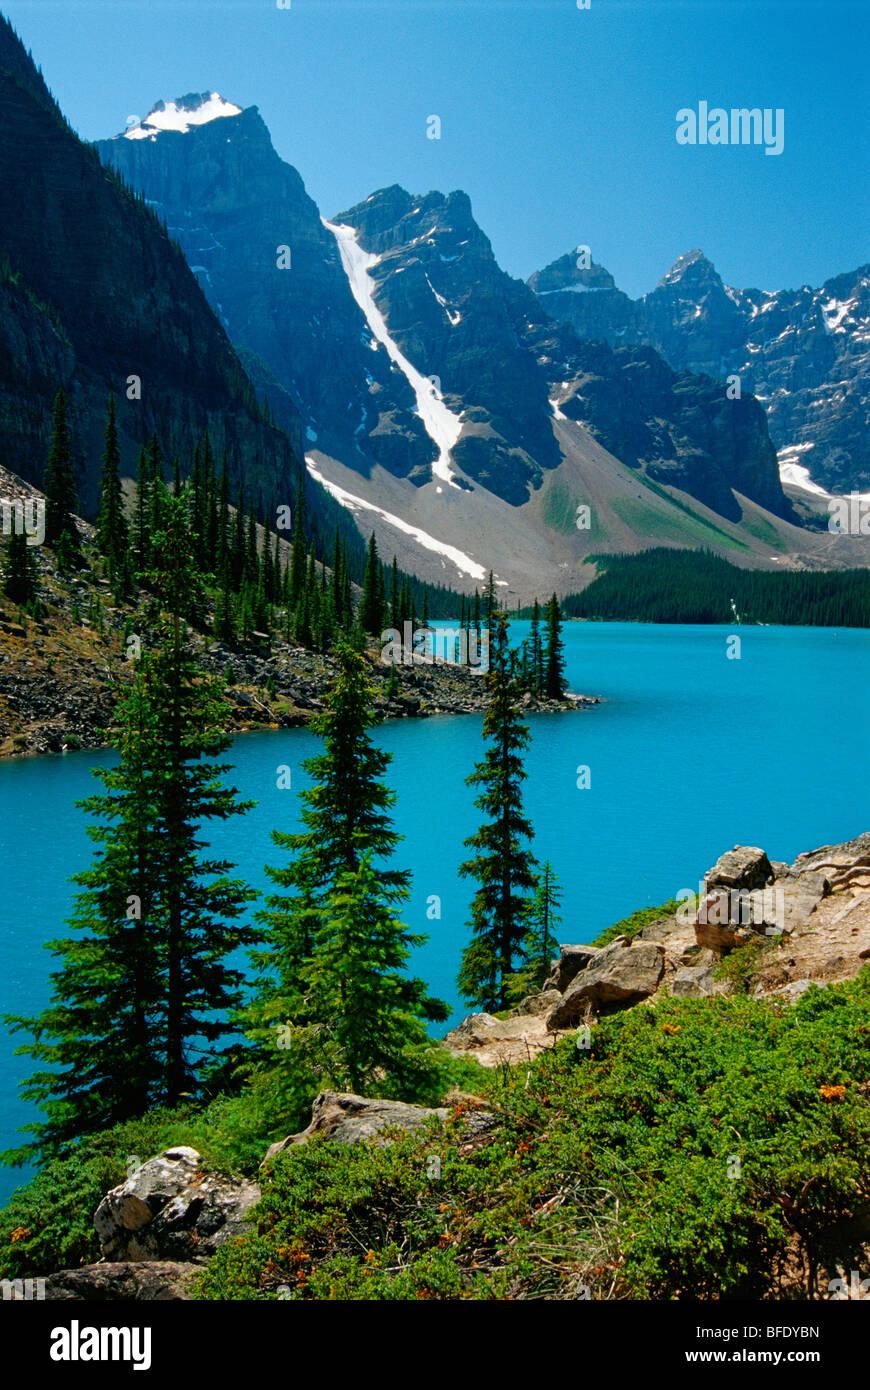 Moraine Lake and the Wenkchemna Peaks, Banff National Park, Alberta, Canada - Stock Image